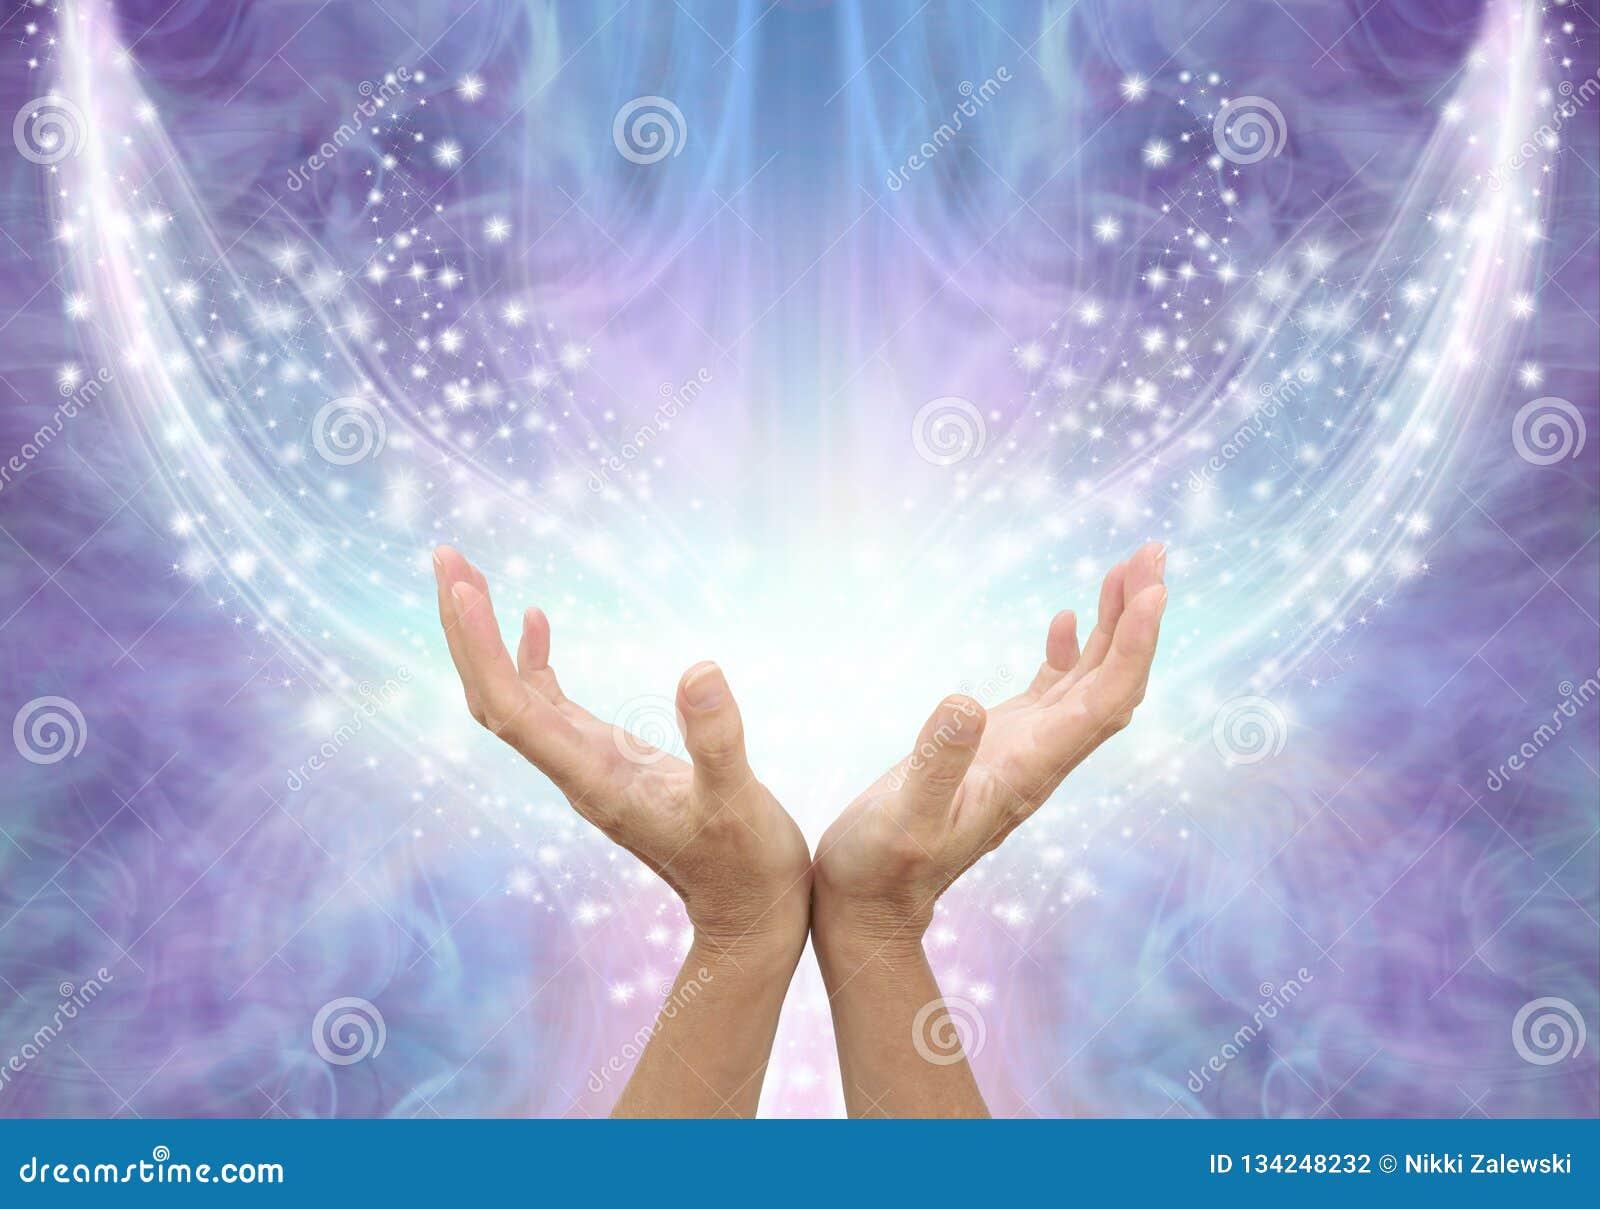 Bathing in Beautiful Healing Resonance